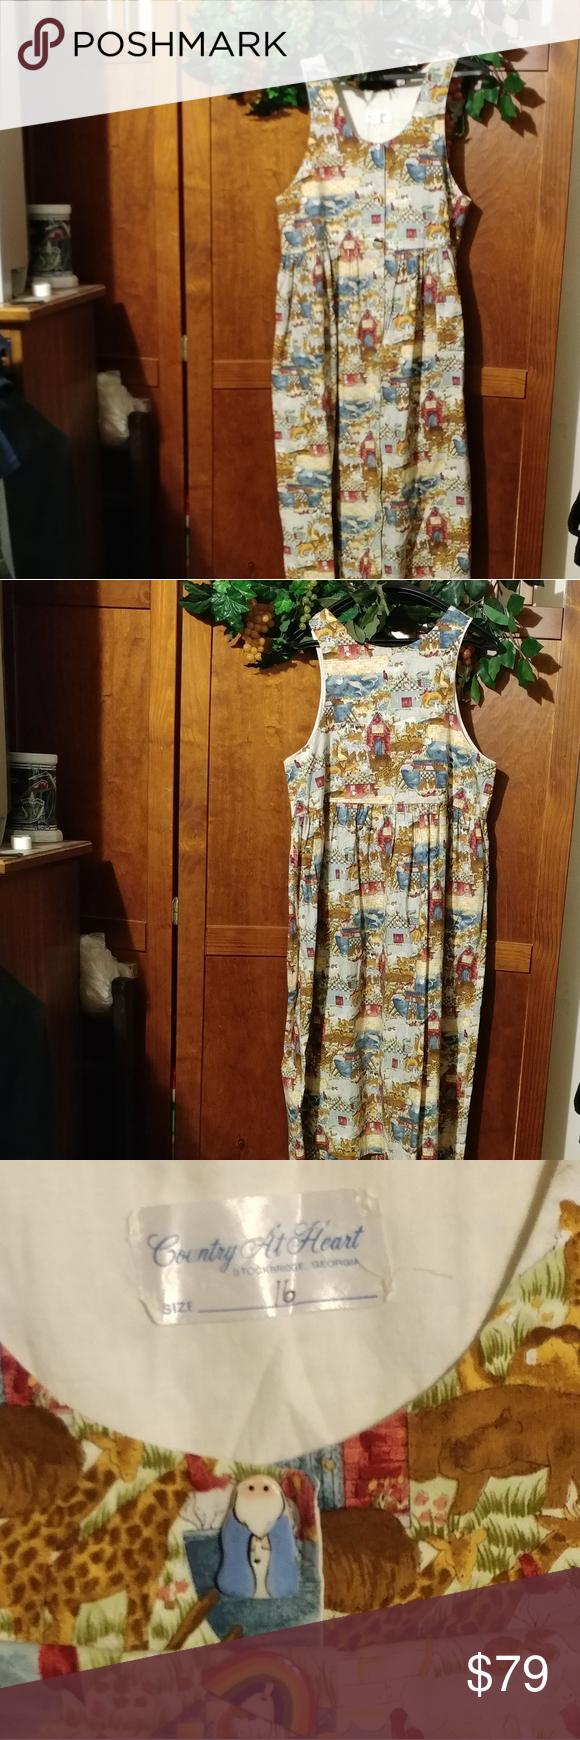 Summer Dress Noah S Ark Theme Size 16 Clothes Design Summer Dresses London Times Dress [ 1740 x 580 Pixel ]